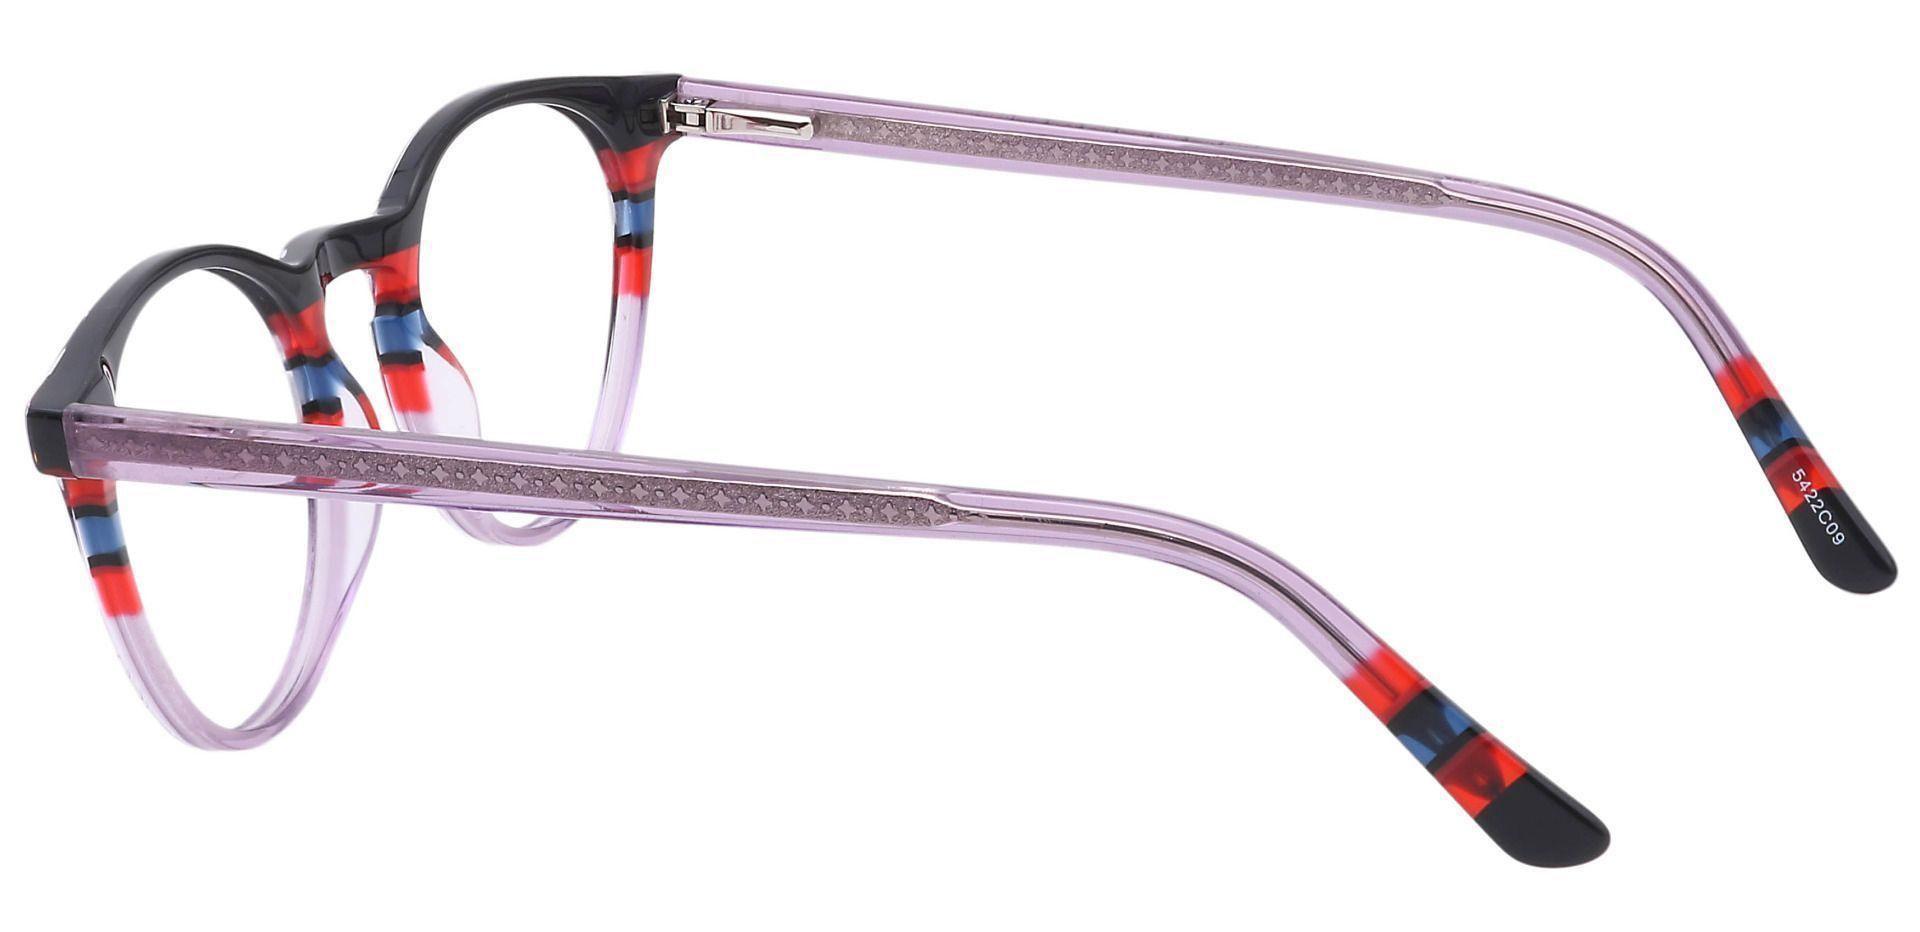 Jellie Round Progressive Glasses - Black/red Lavender Stripe  Purple